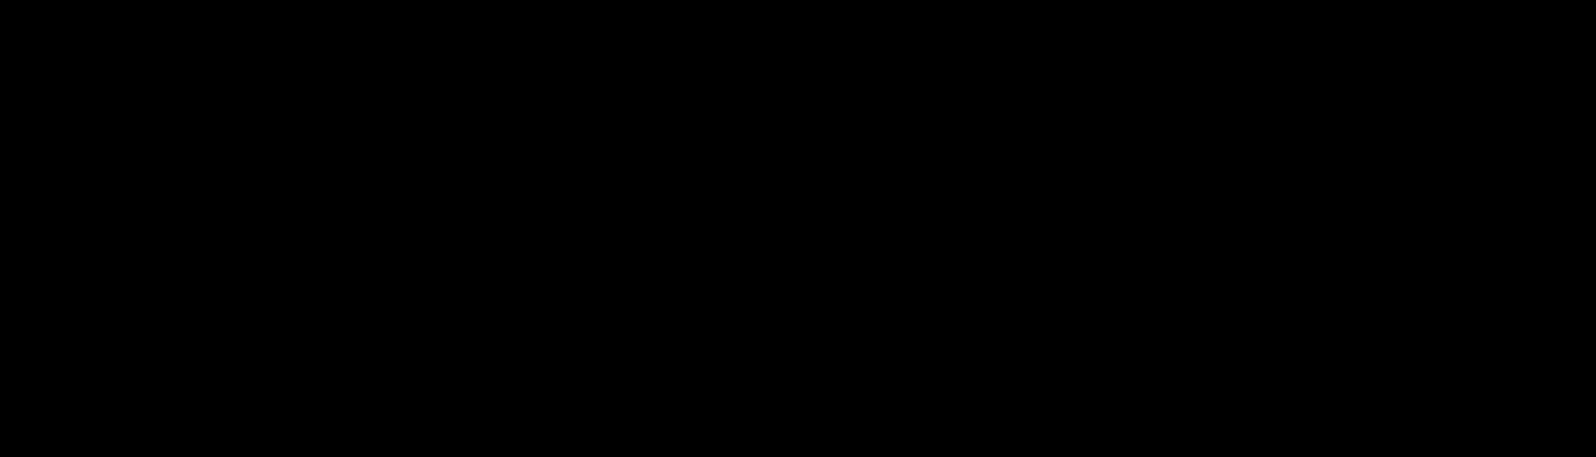 XCMG HDD horizontal directional driller